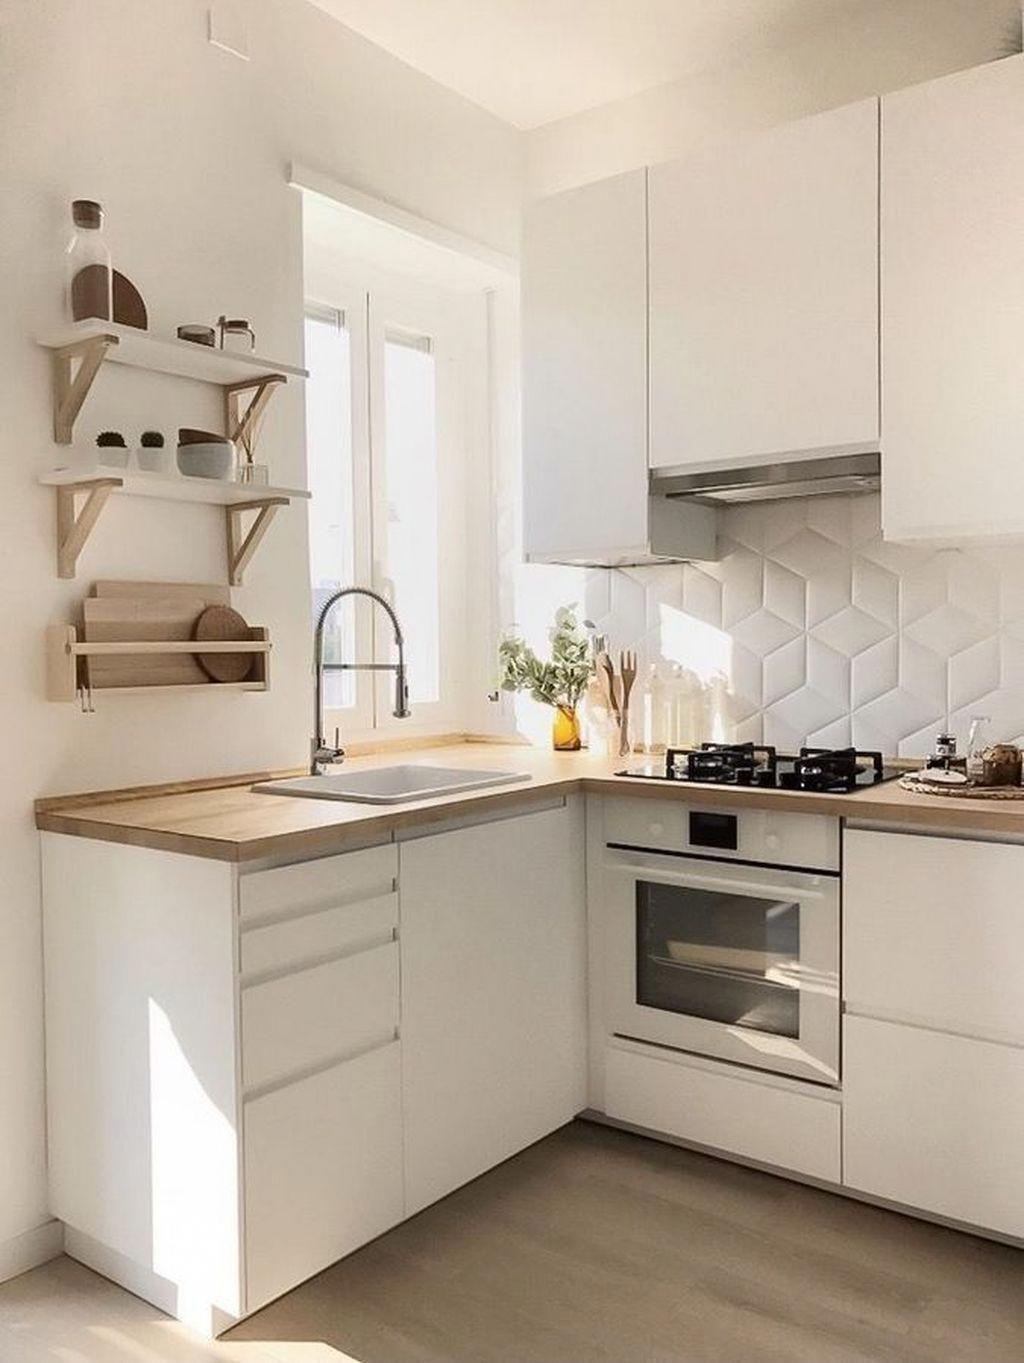 9 Amazing Small Apartment Kitchen Ideas   Kitchen   Small ...